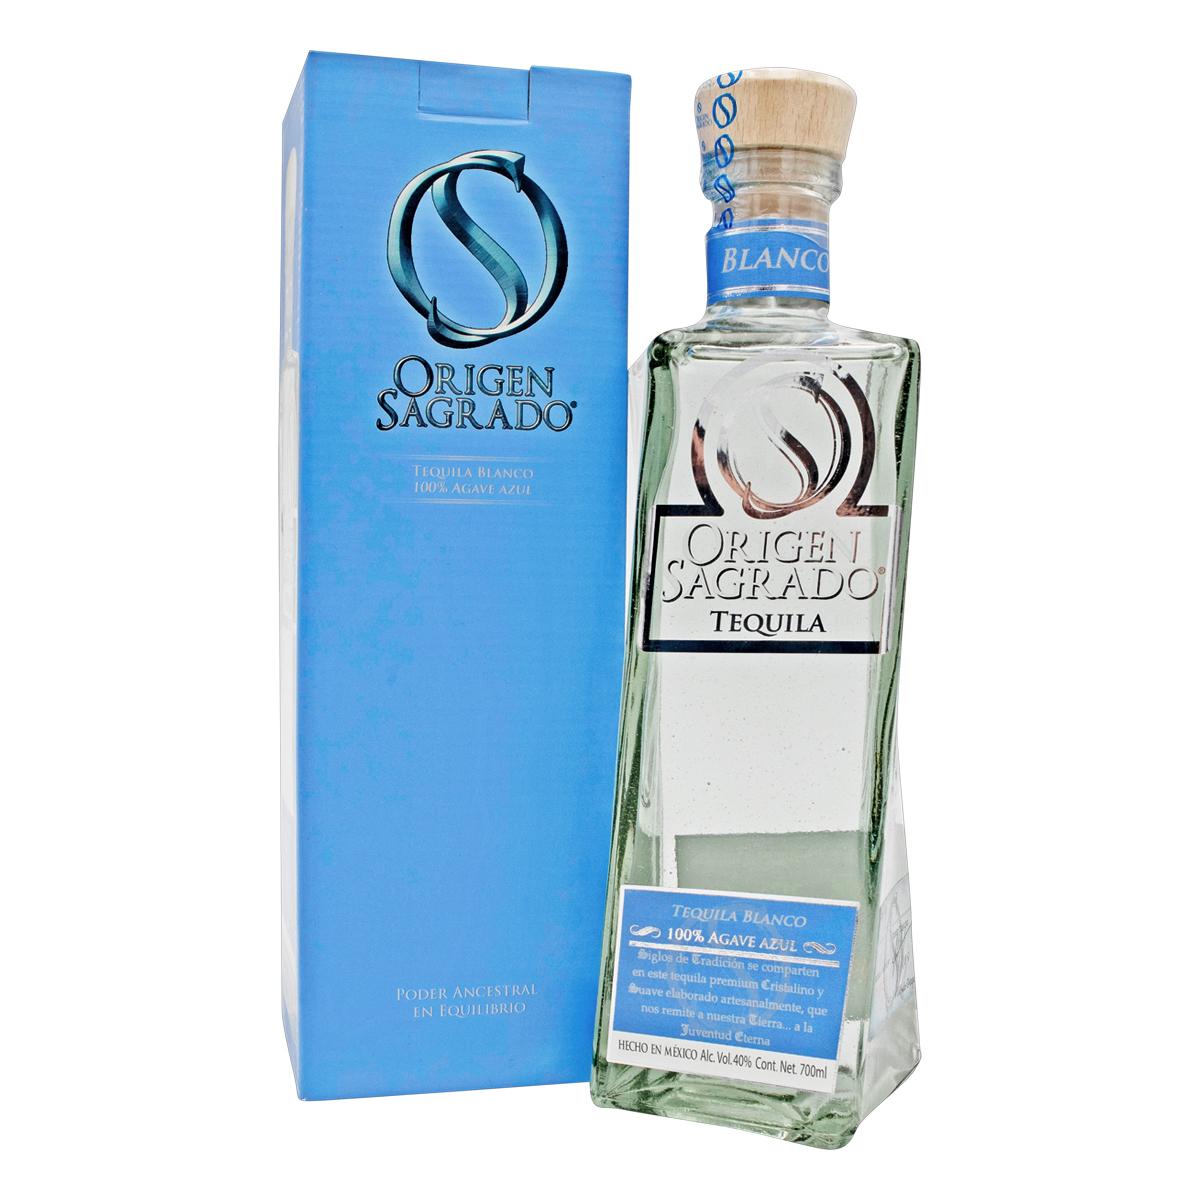 Sammlerstück! Origen Sagrado - Tequila Blanco